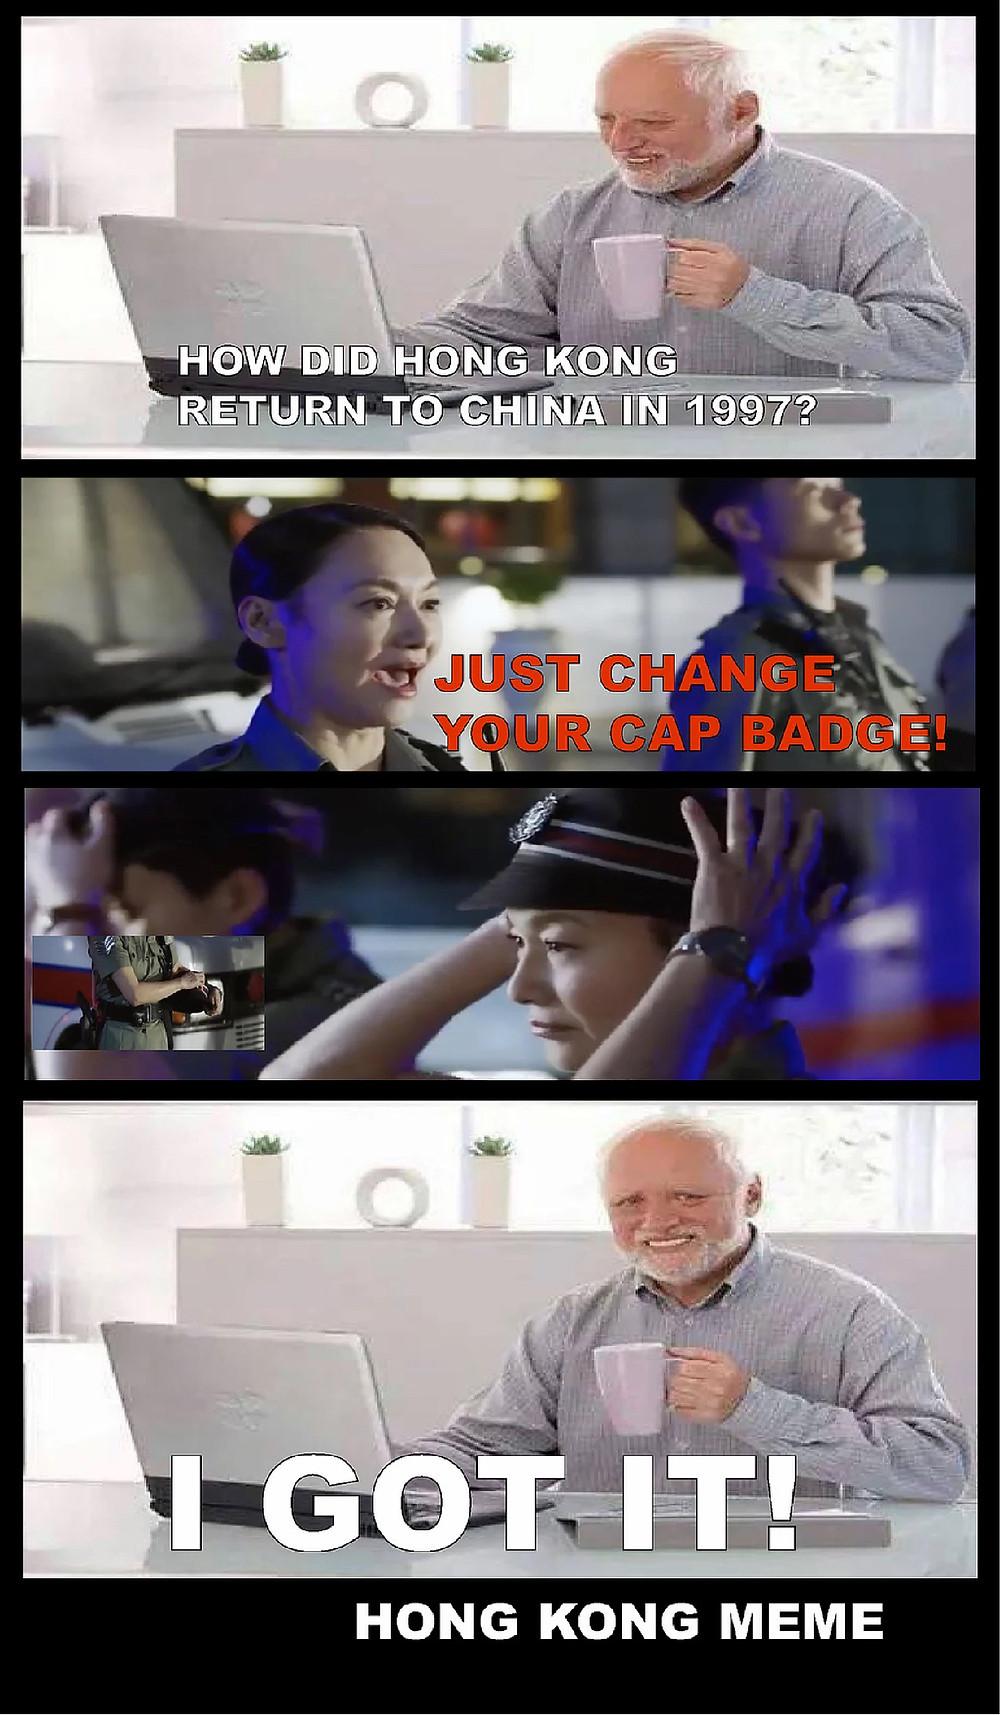 FILE PHOTO: Hong Kong Meme on the Lack of Decolonization.   ©imgflip/Huaxia Film Distribution Company; Ryota Nakanishi